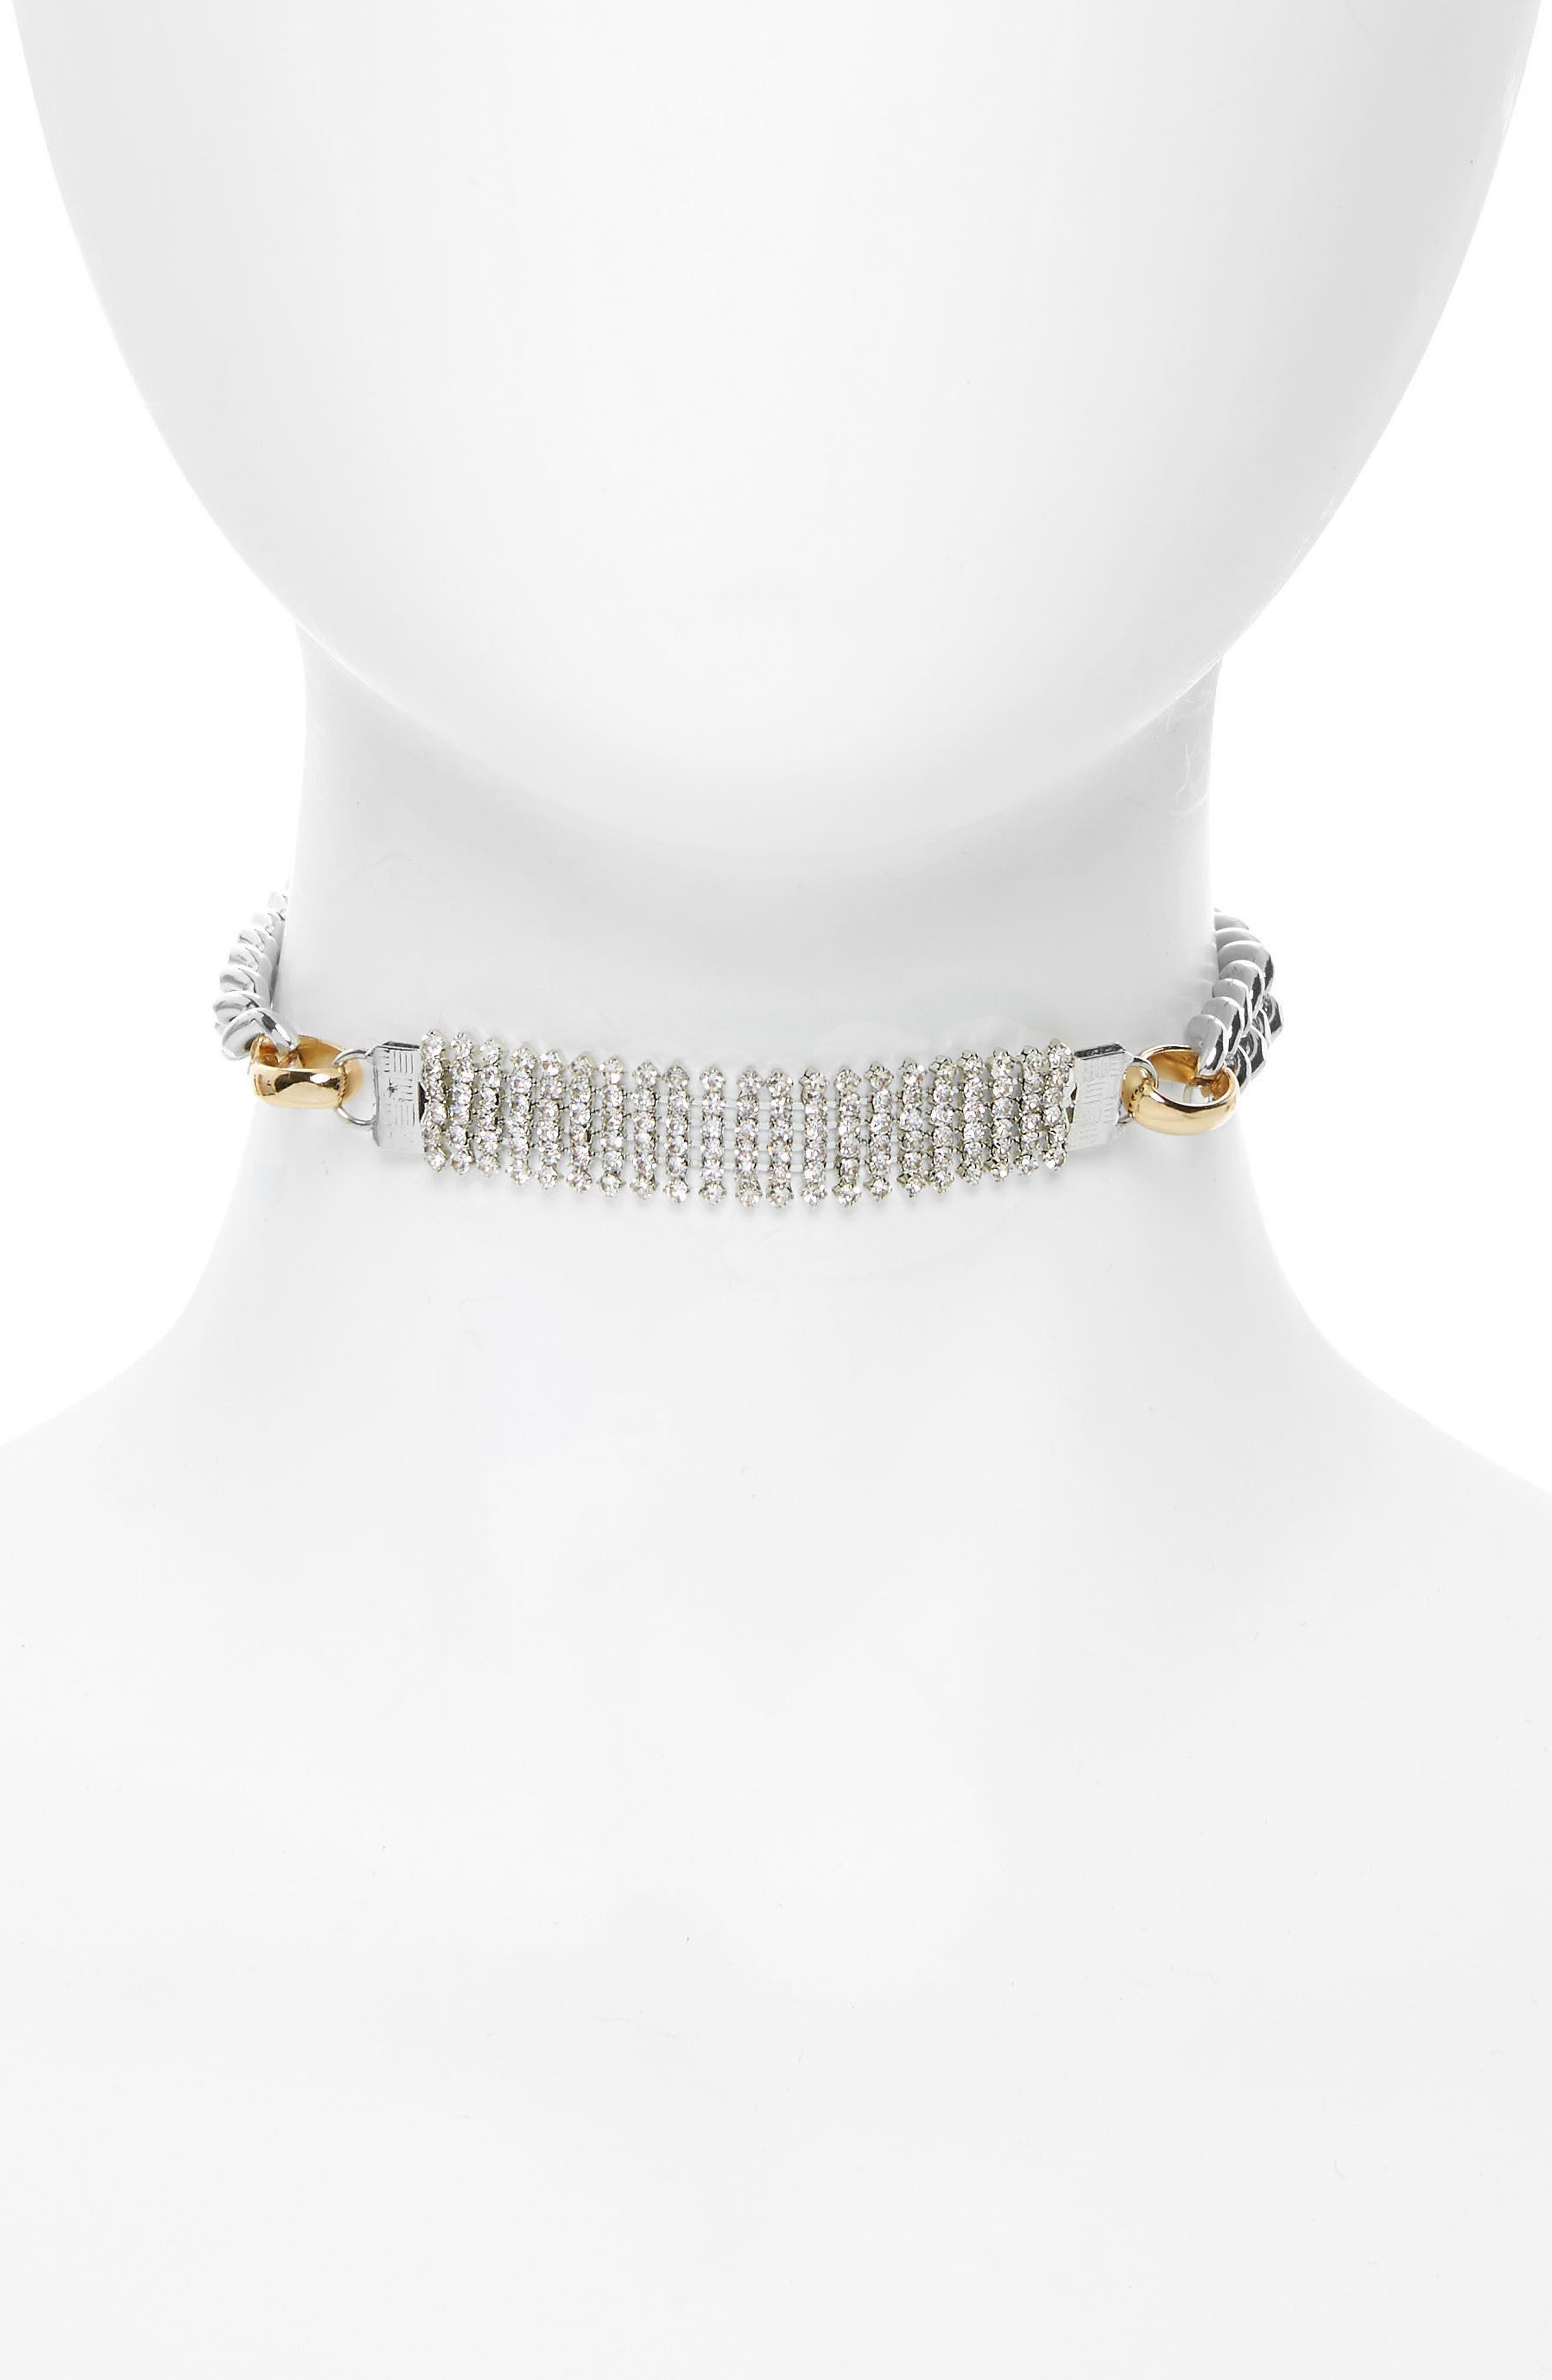 Crystal Chain Choker,                         Main,                         color, Silver/ Gold/ Crystal